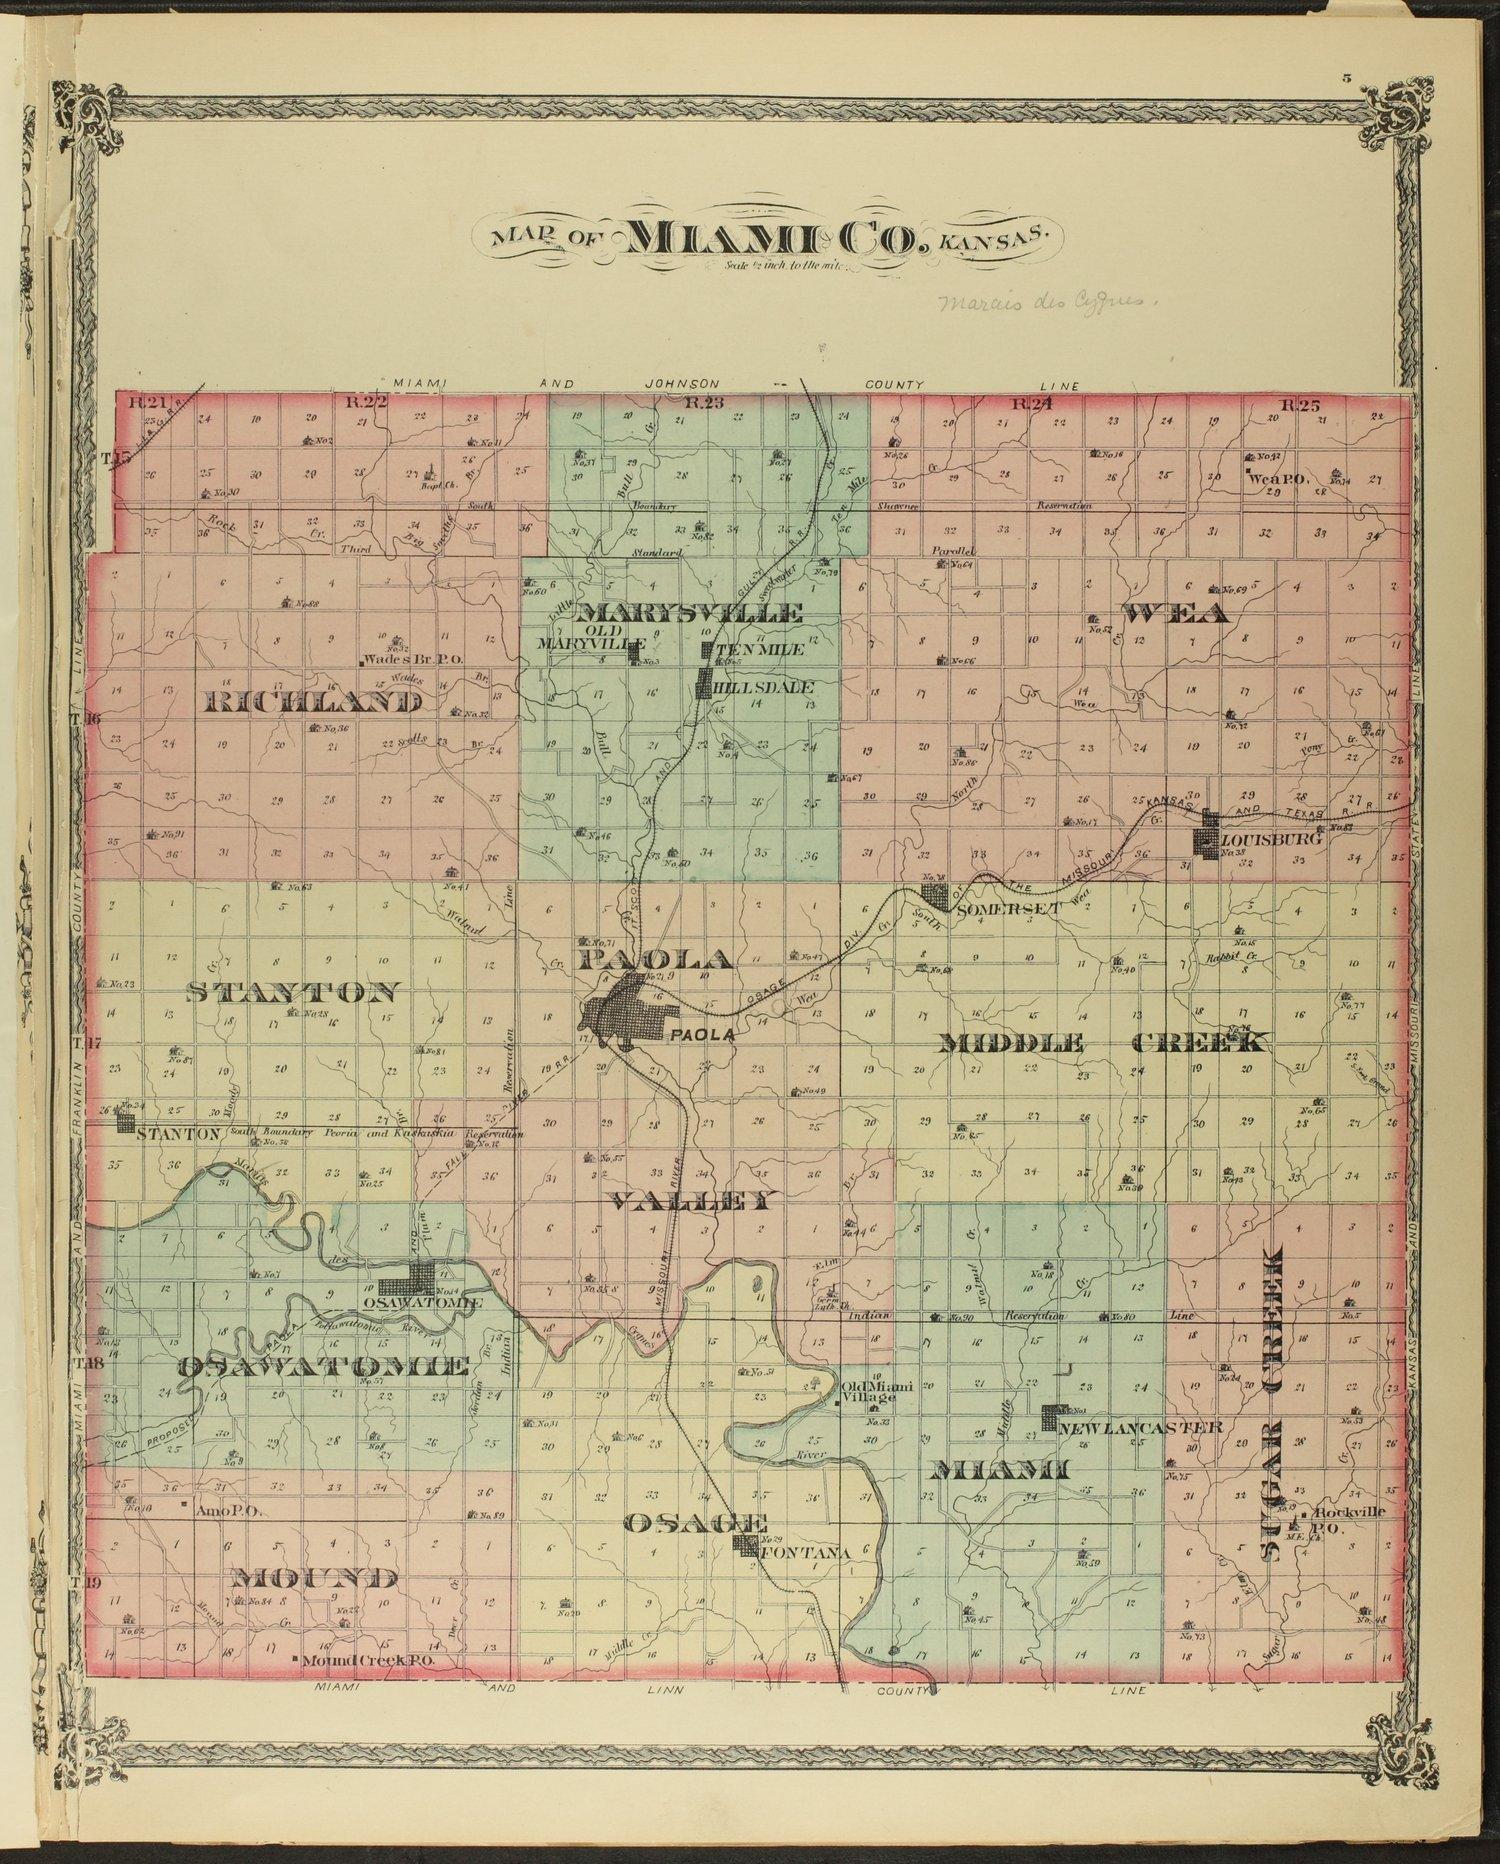 An illustrated historical atlas of Miami County, Kansas - 5